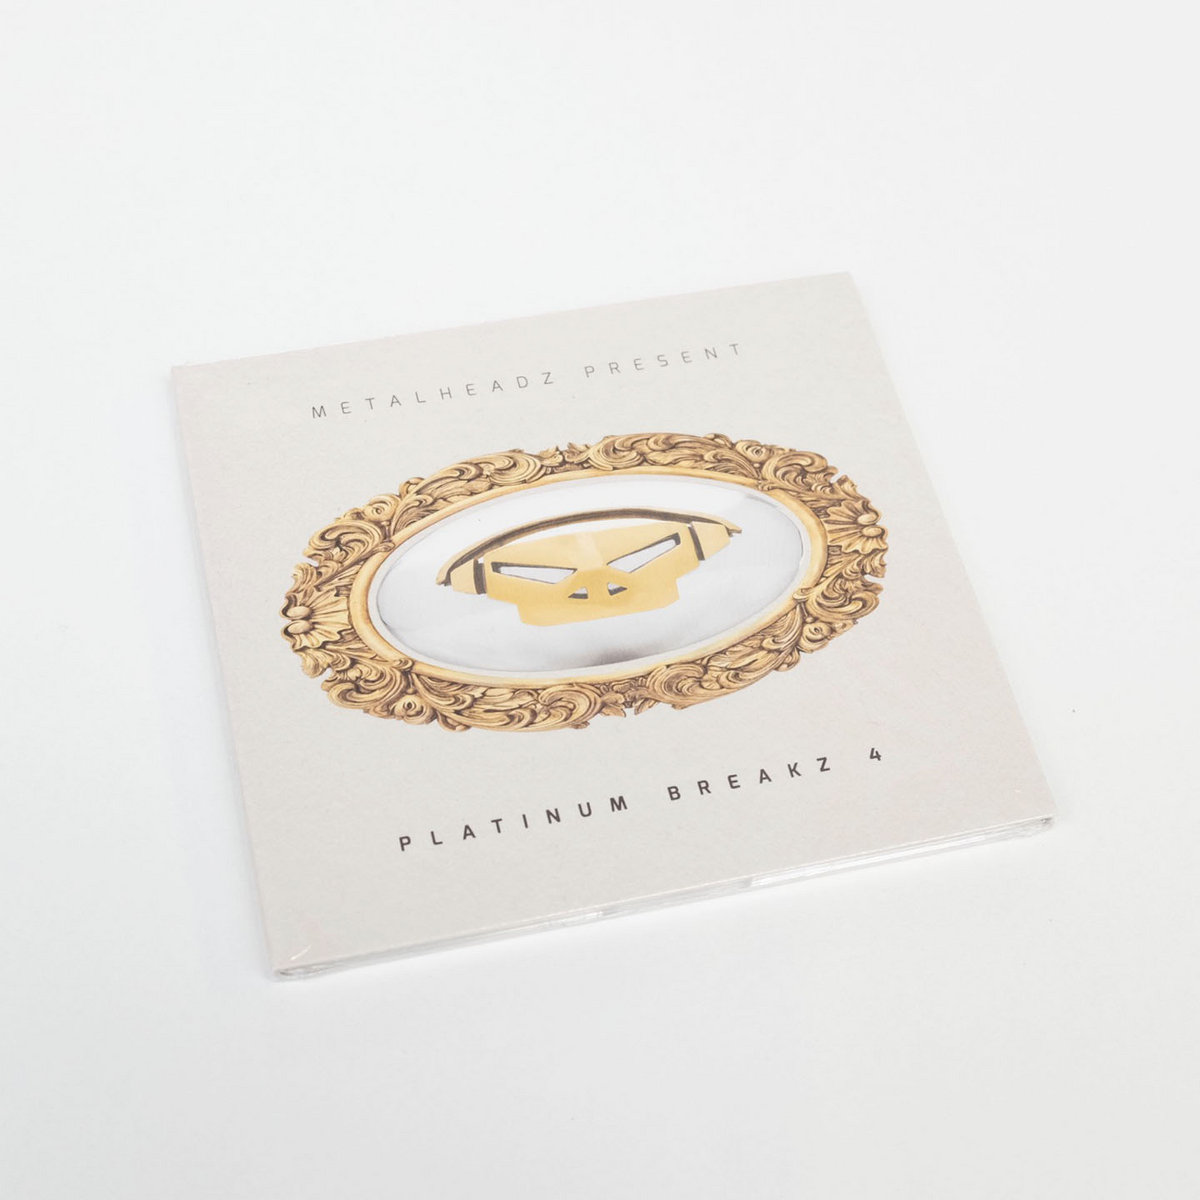 METACD002 - Platinum Breakz Vol 4 Album   Metalheadz